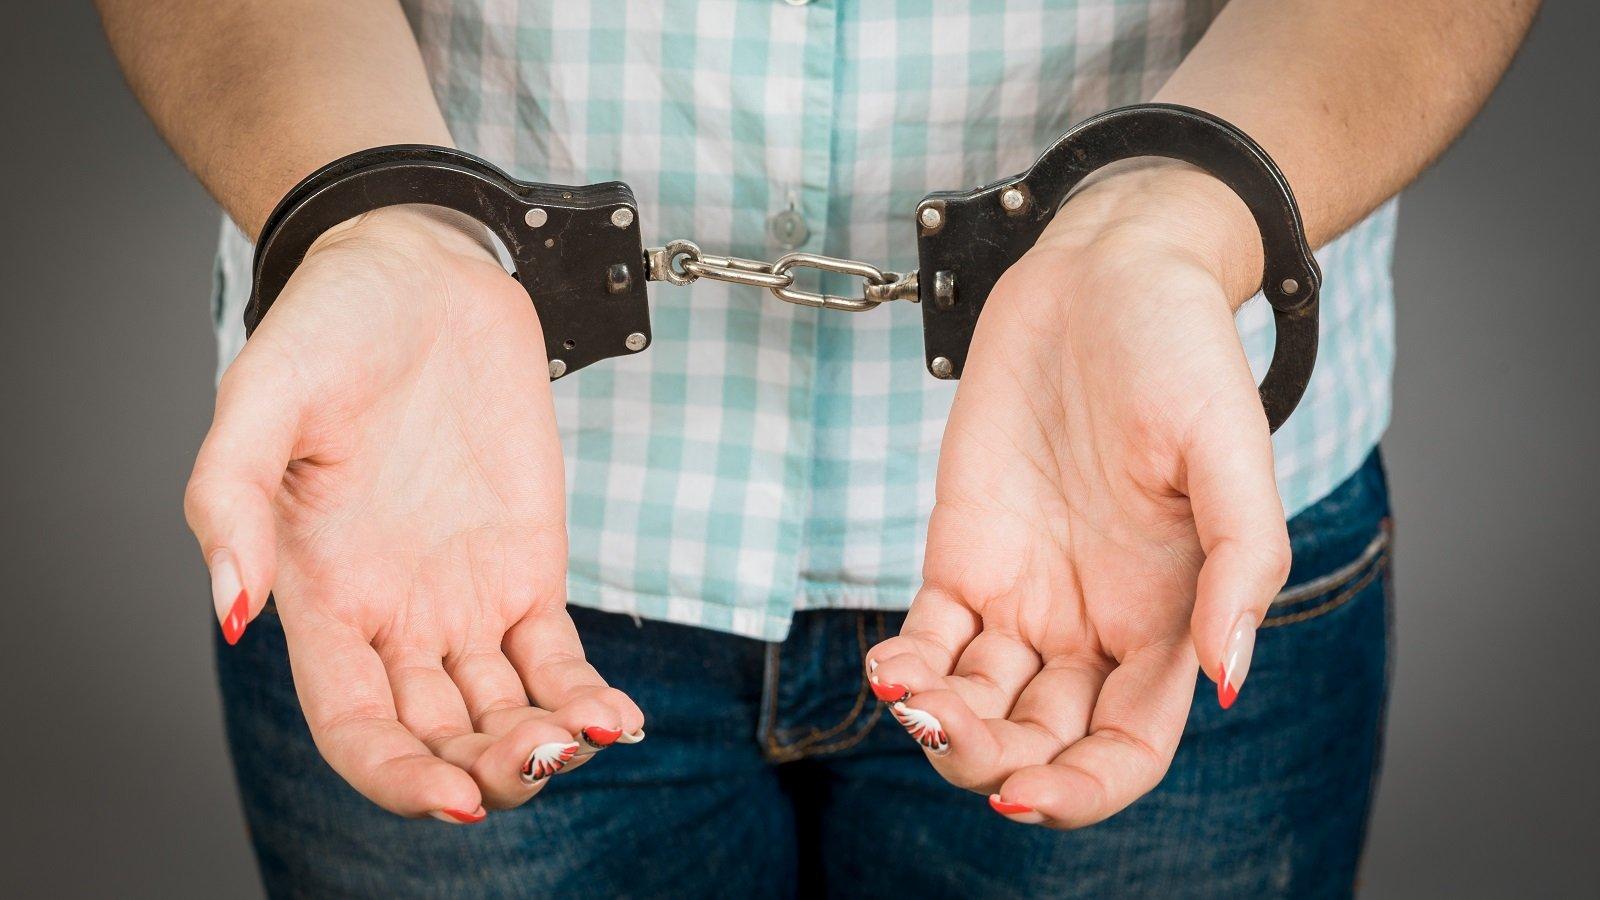 A woman in handcuffs. | Photo: Shutterstock.